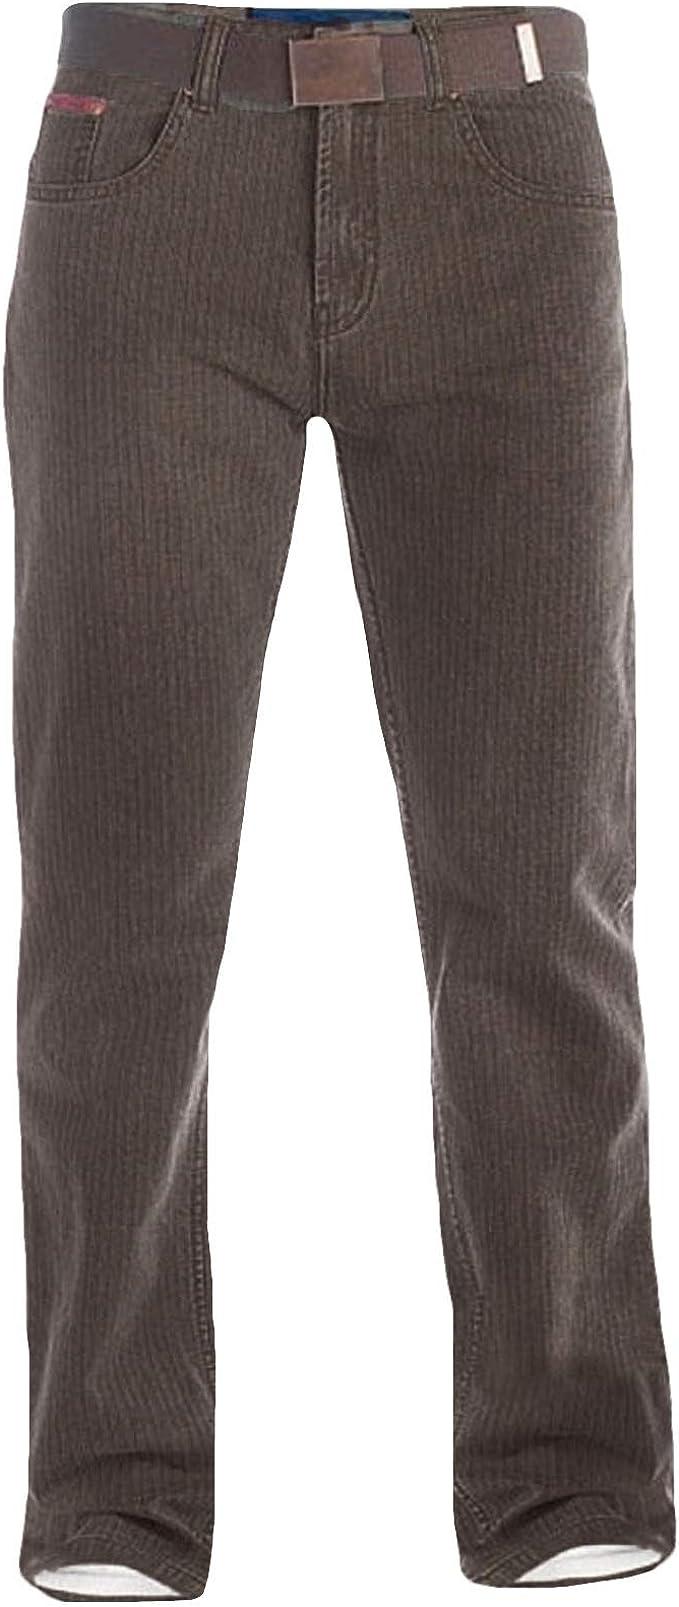 with Belt in Brown Duke London Mens Regular Beford Cord Jeans Brian